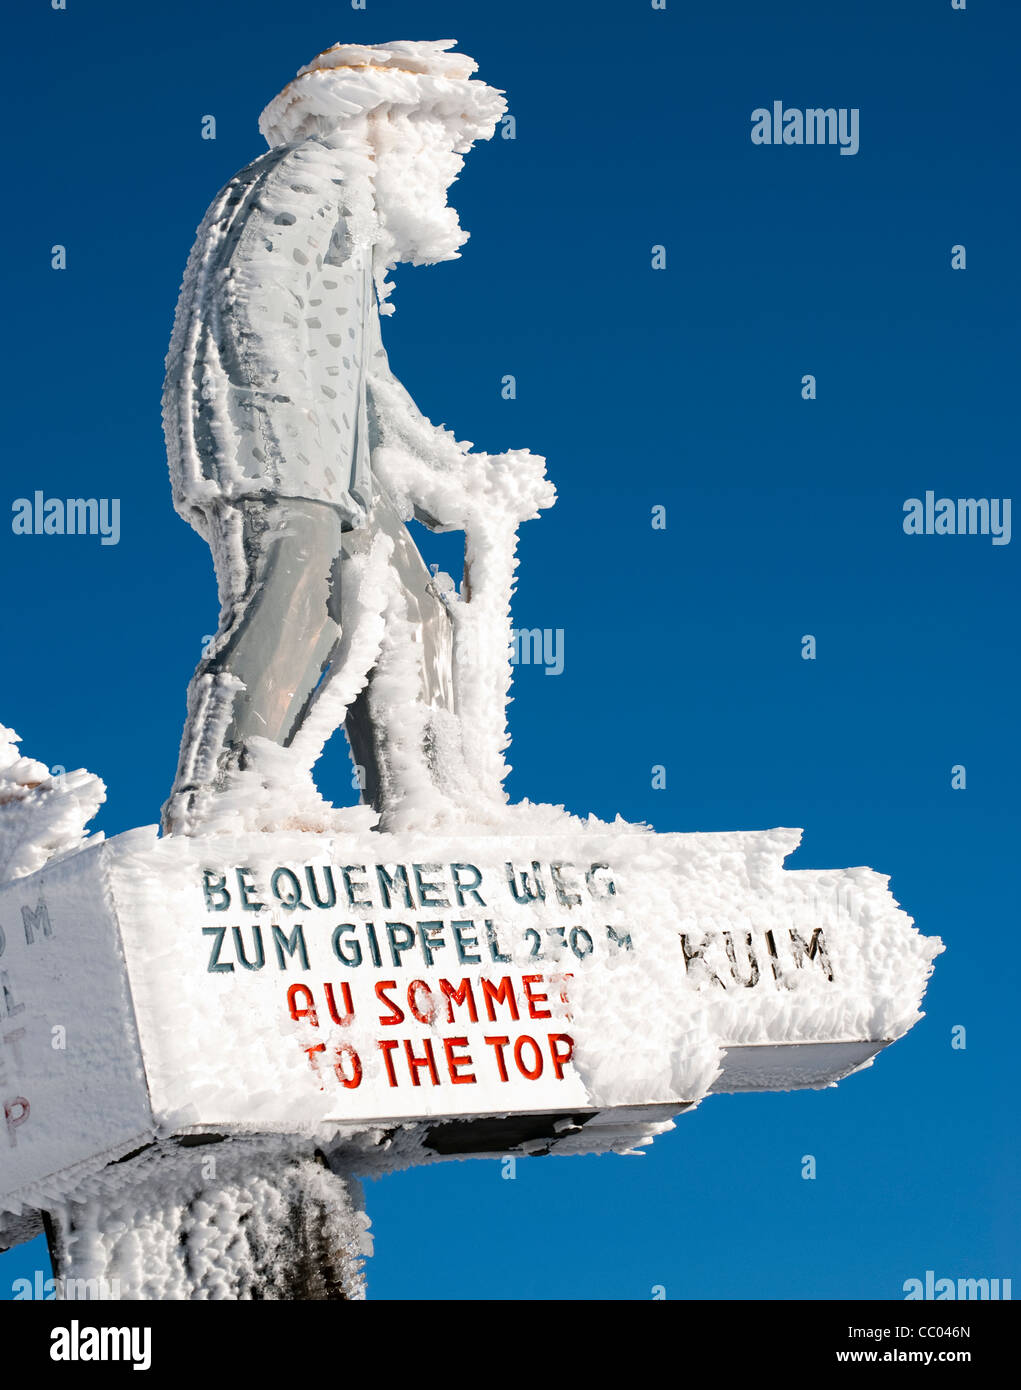 Winter freeze on top of mount Rigi, Switzerland - Stock Image